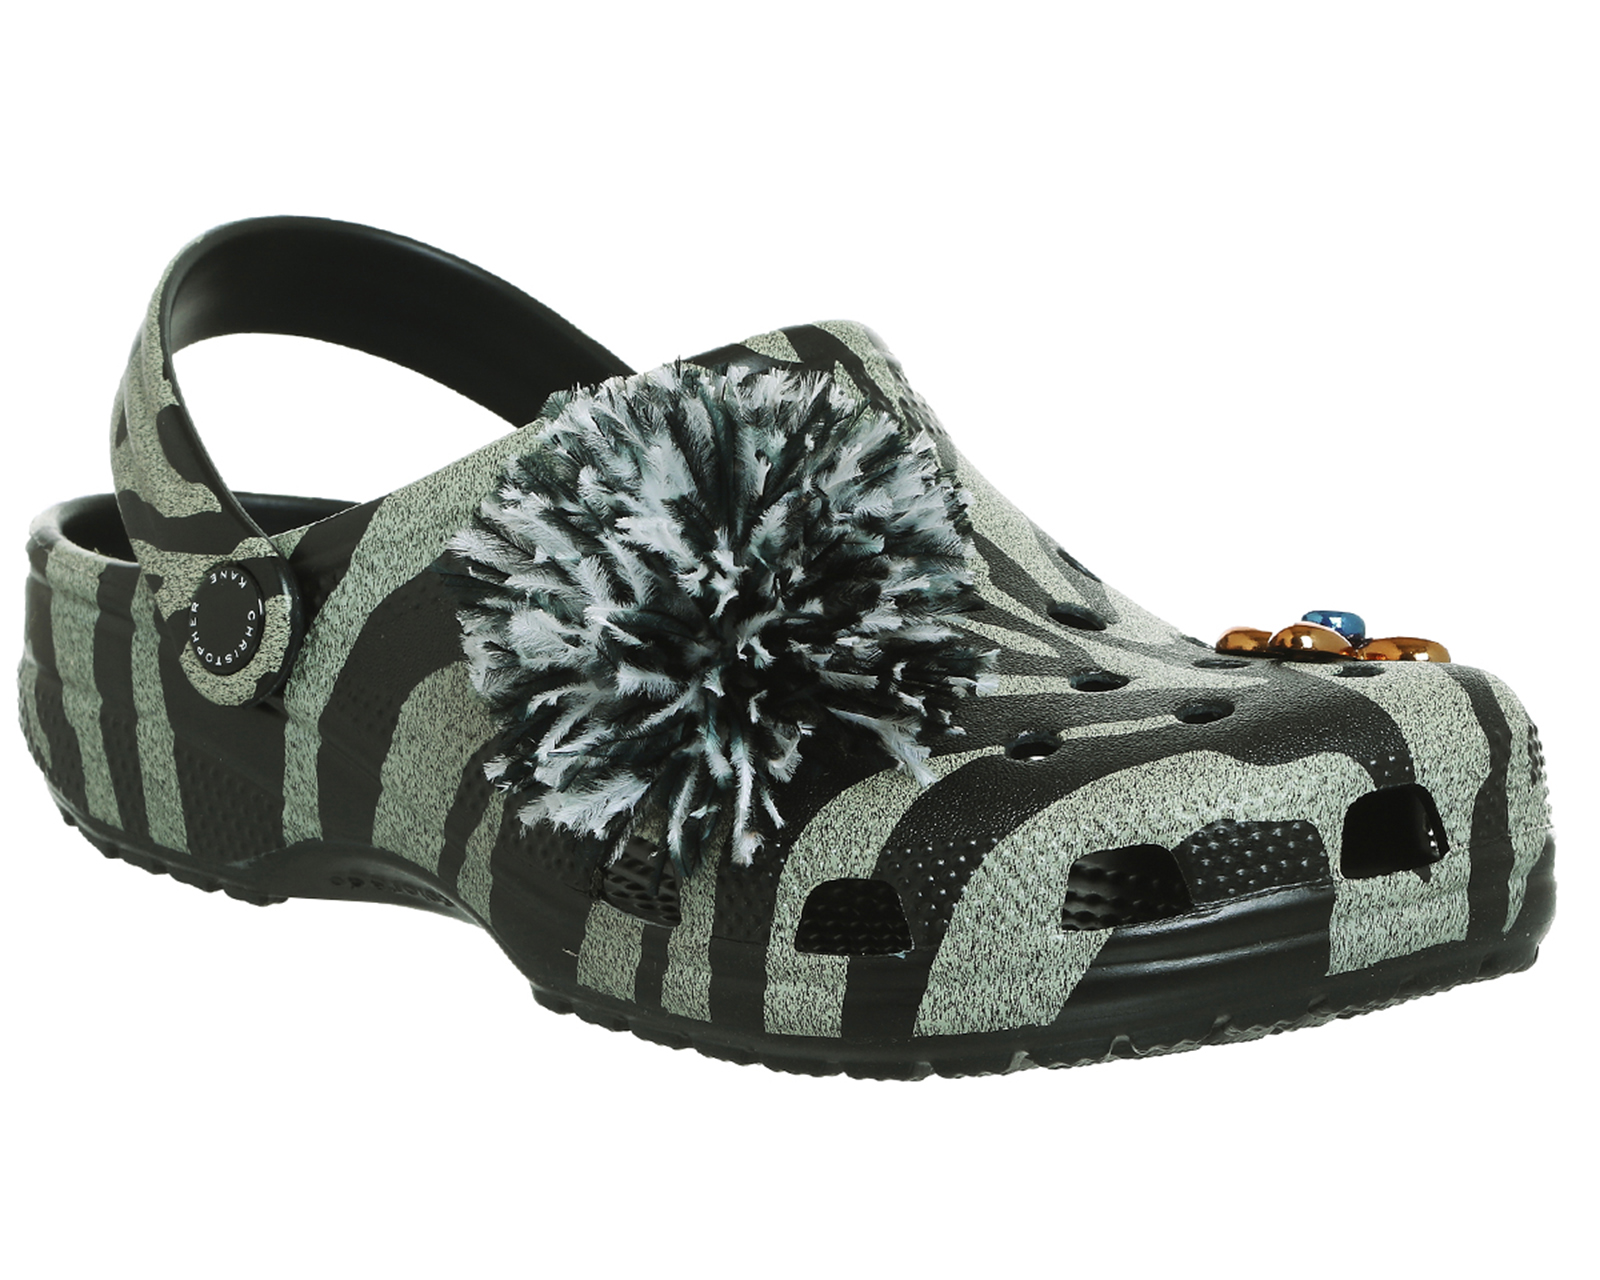 cac867418a0383 Details about Womens Crocs Christopher Kane X Crocs AVOCADO Sandals